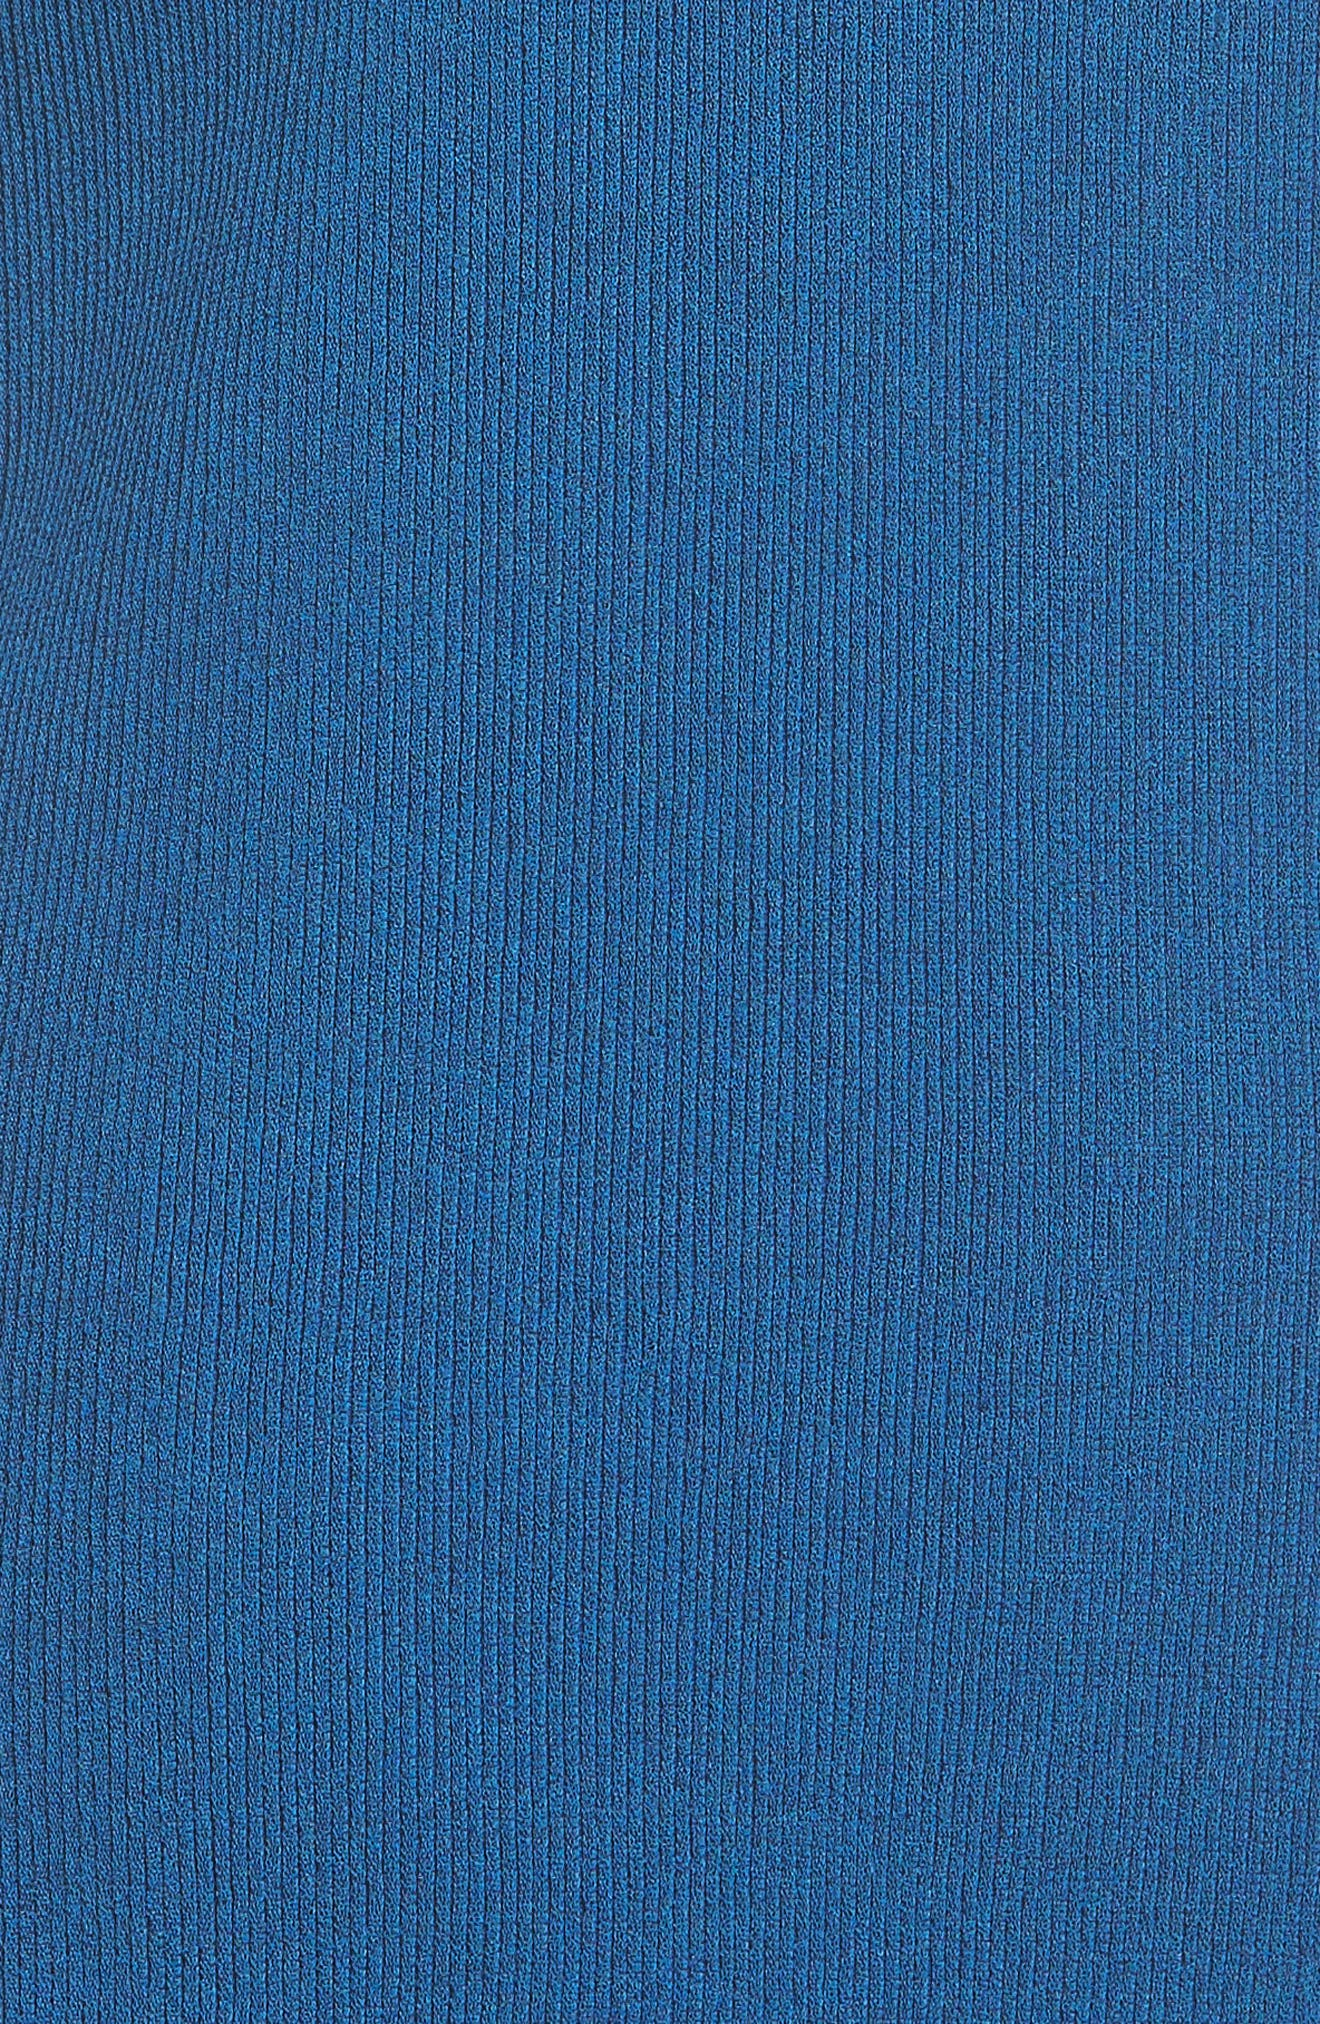 Etelina Sweater,                             Alternate thumbnail 5, color,                             424